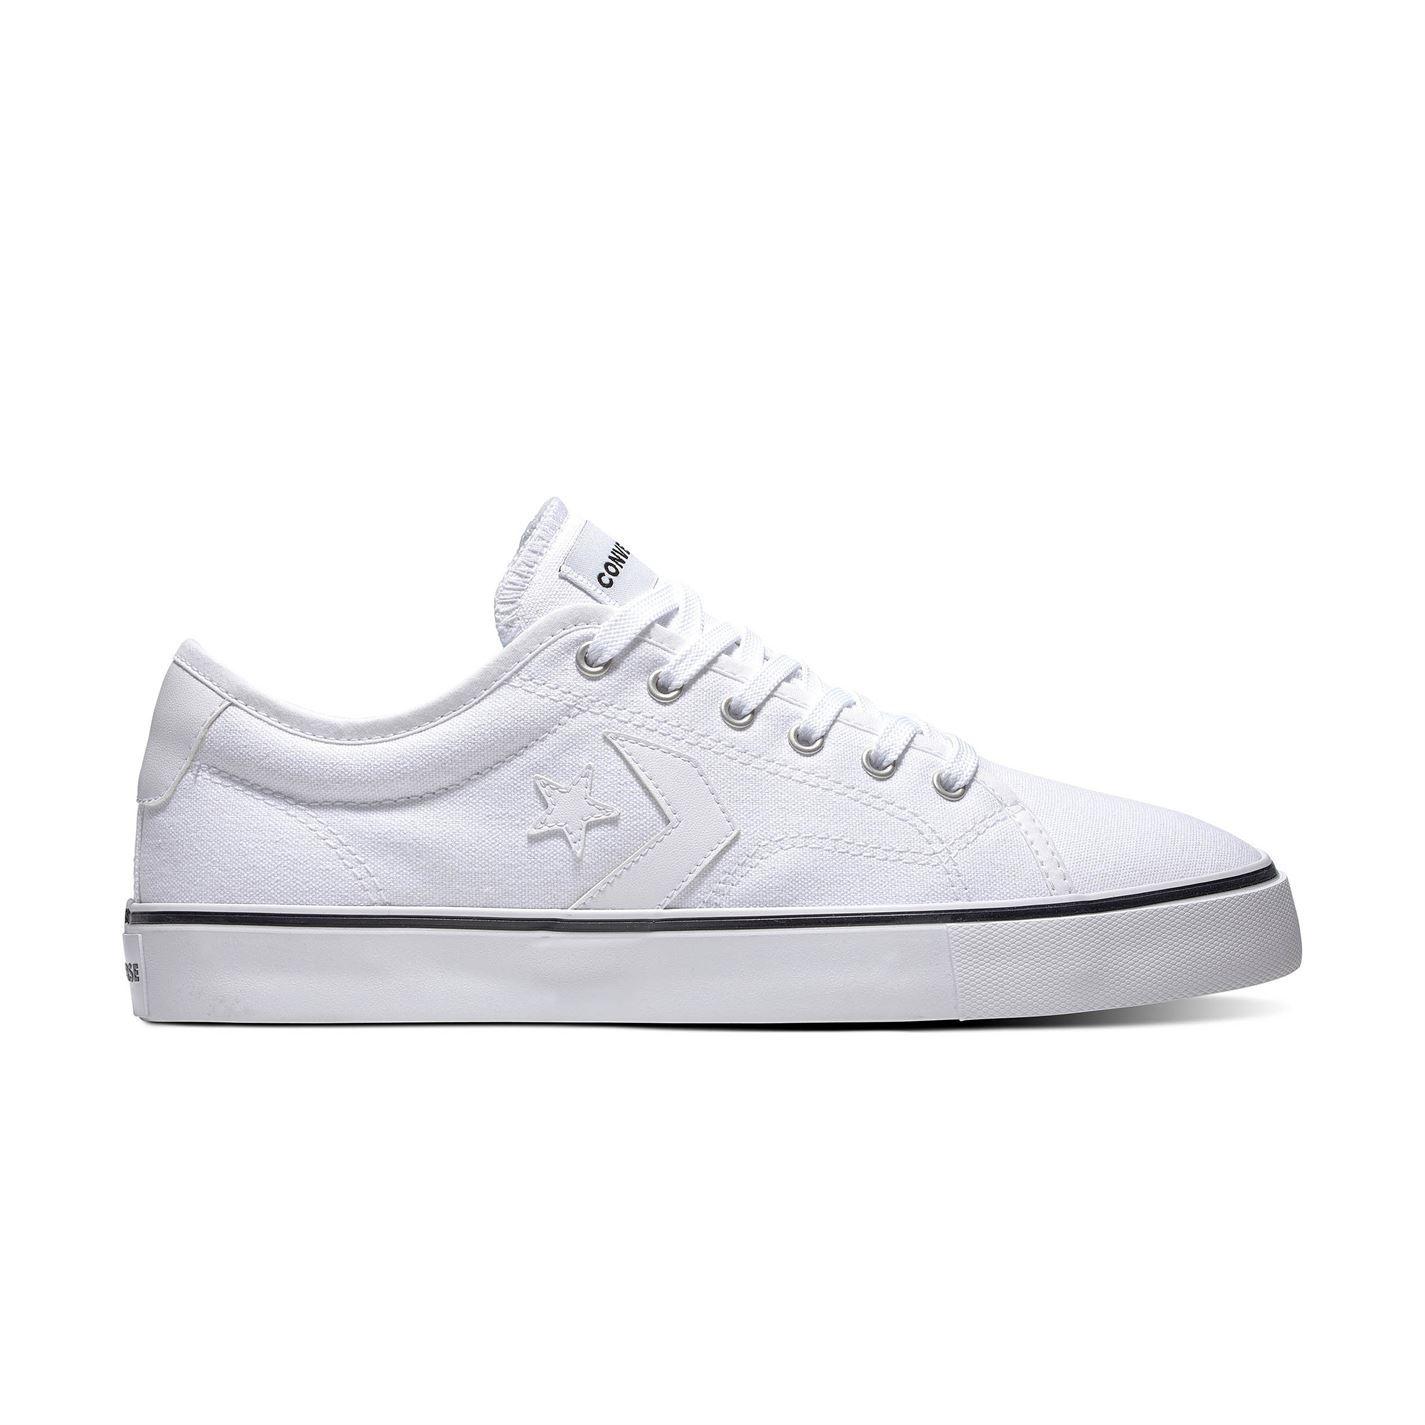 Converse-Ox-REPLAY-Baskets-Pour-Homme-Chaussures-De-Loisirs-Chaussures-Baskets miniature 32